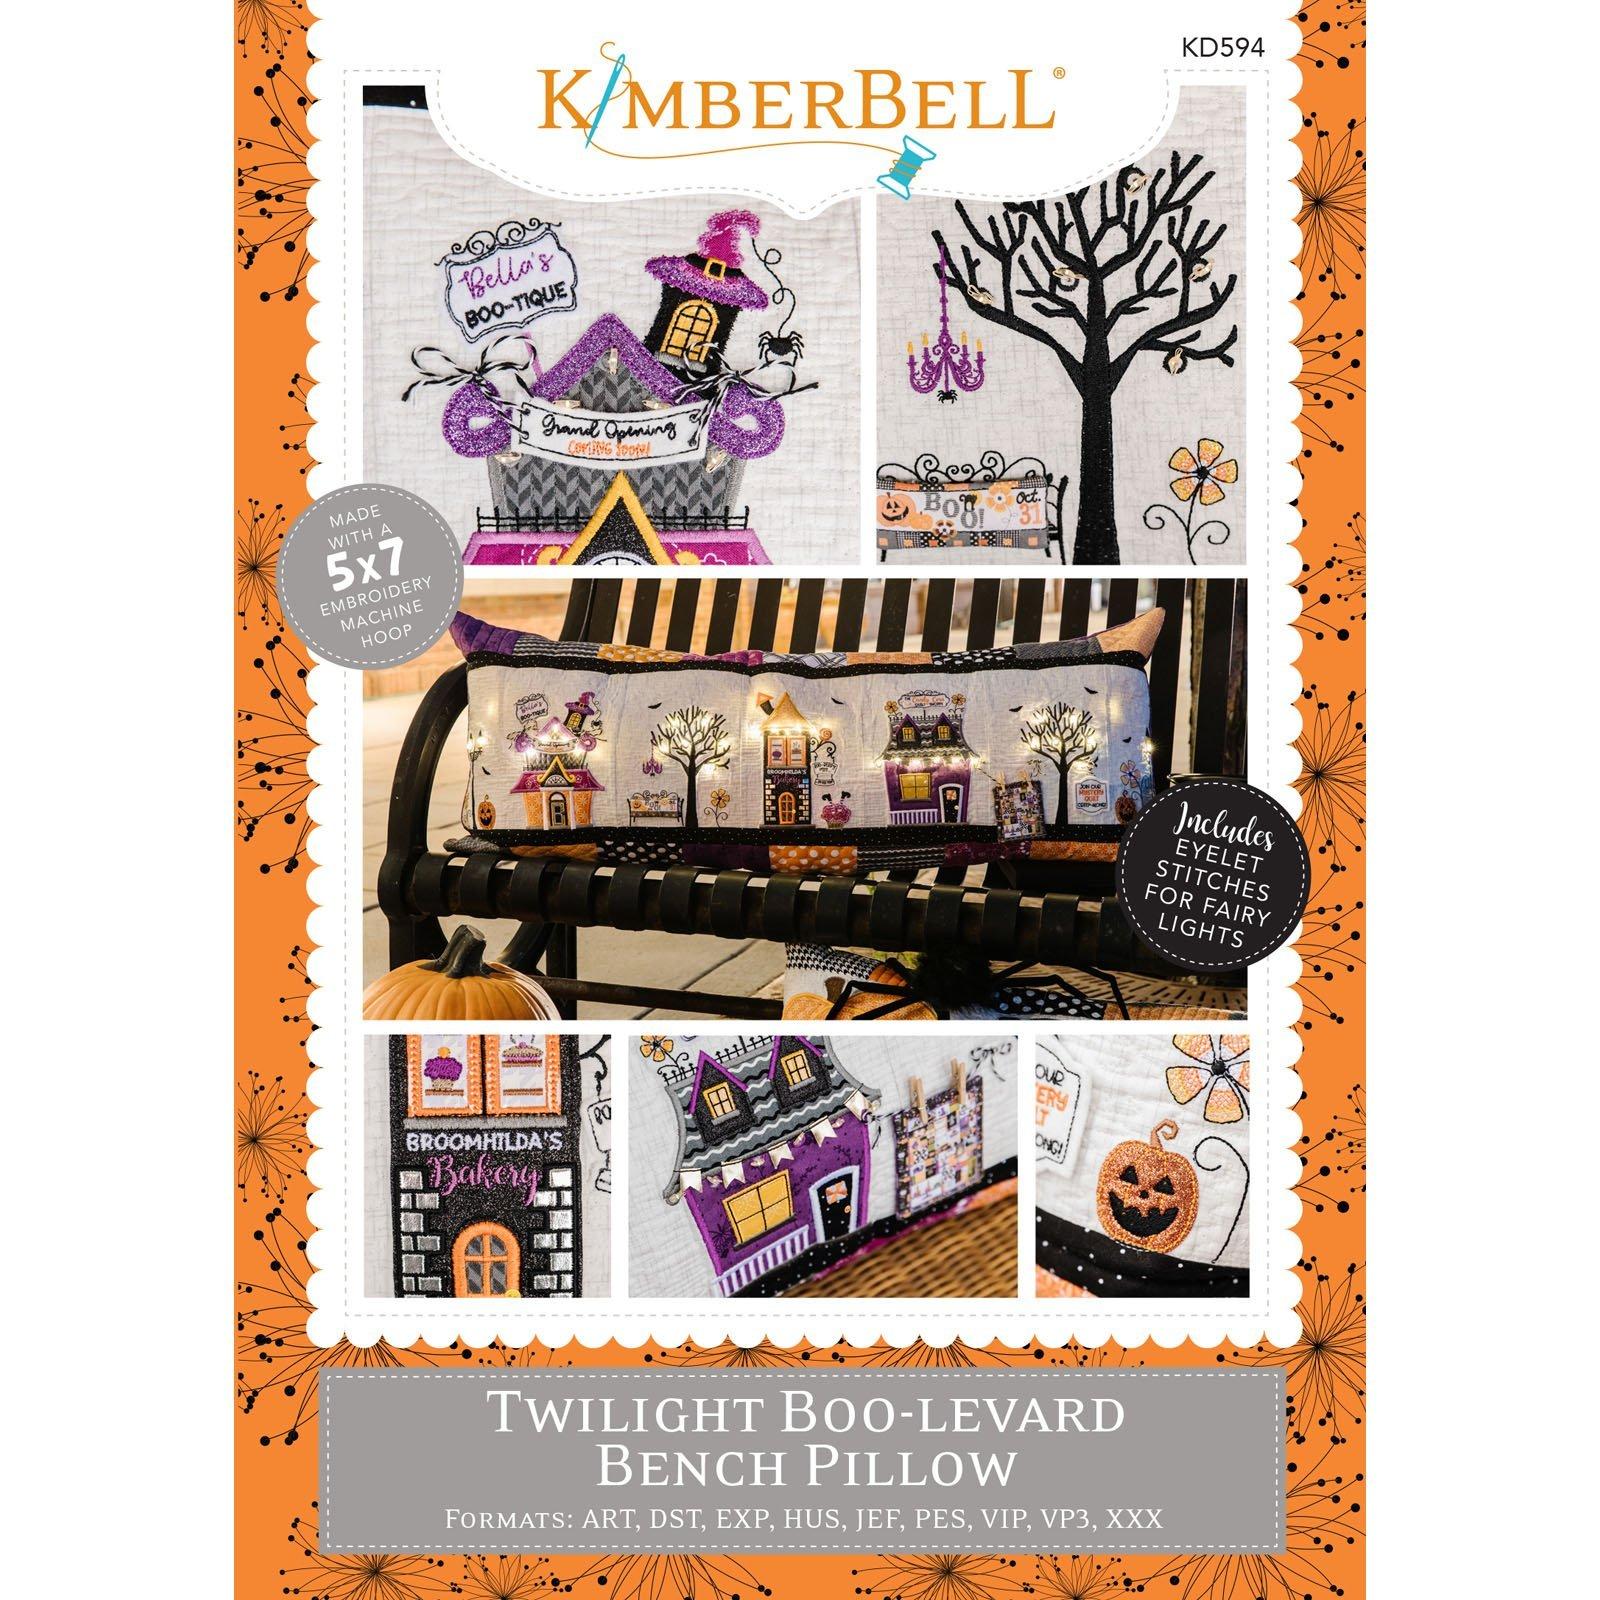 Kimberbell Twilight Boo-Levard Embroidery CD